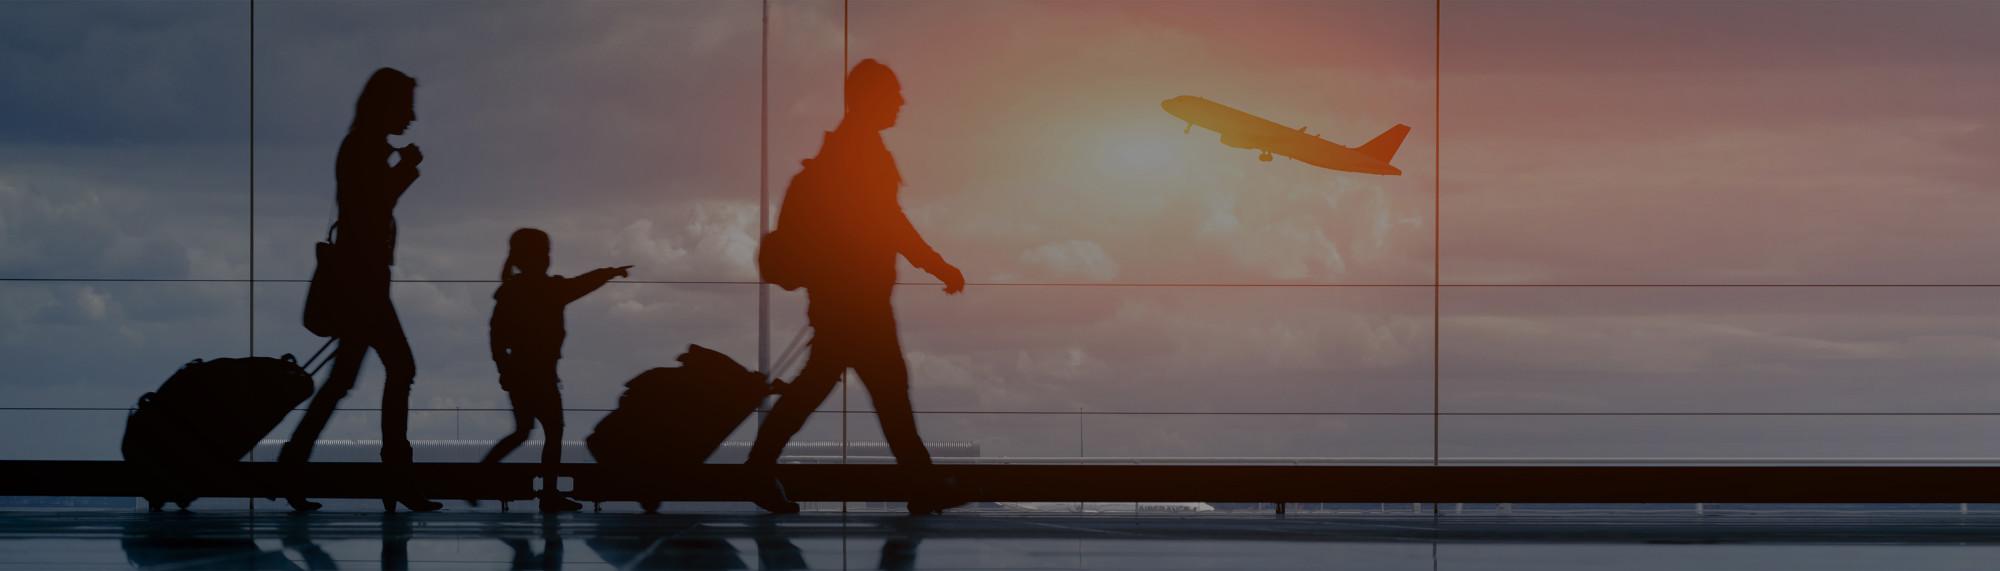 Transat Travel   Vacations, Flights, Cruises & more